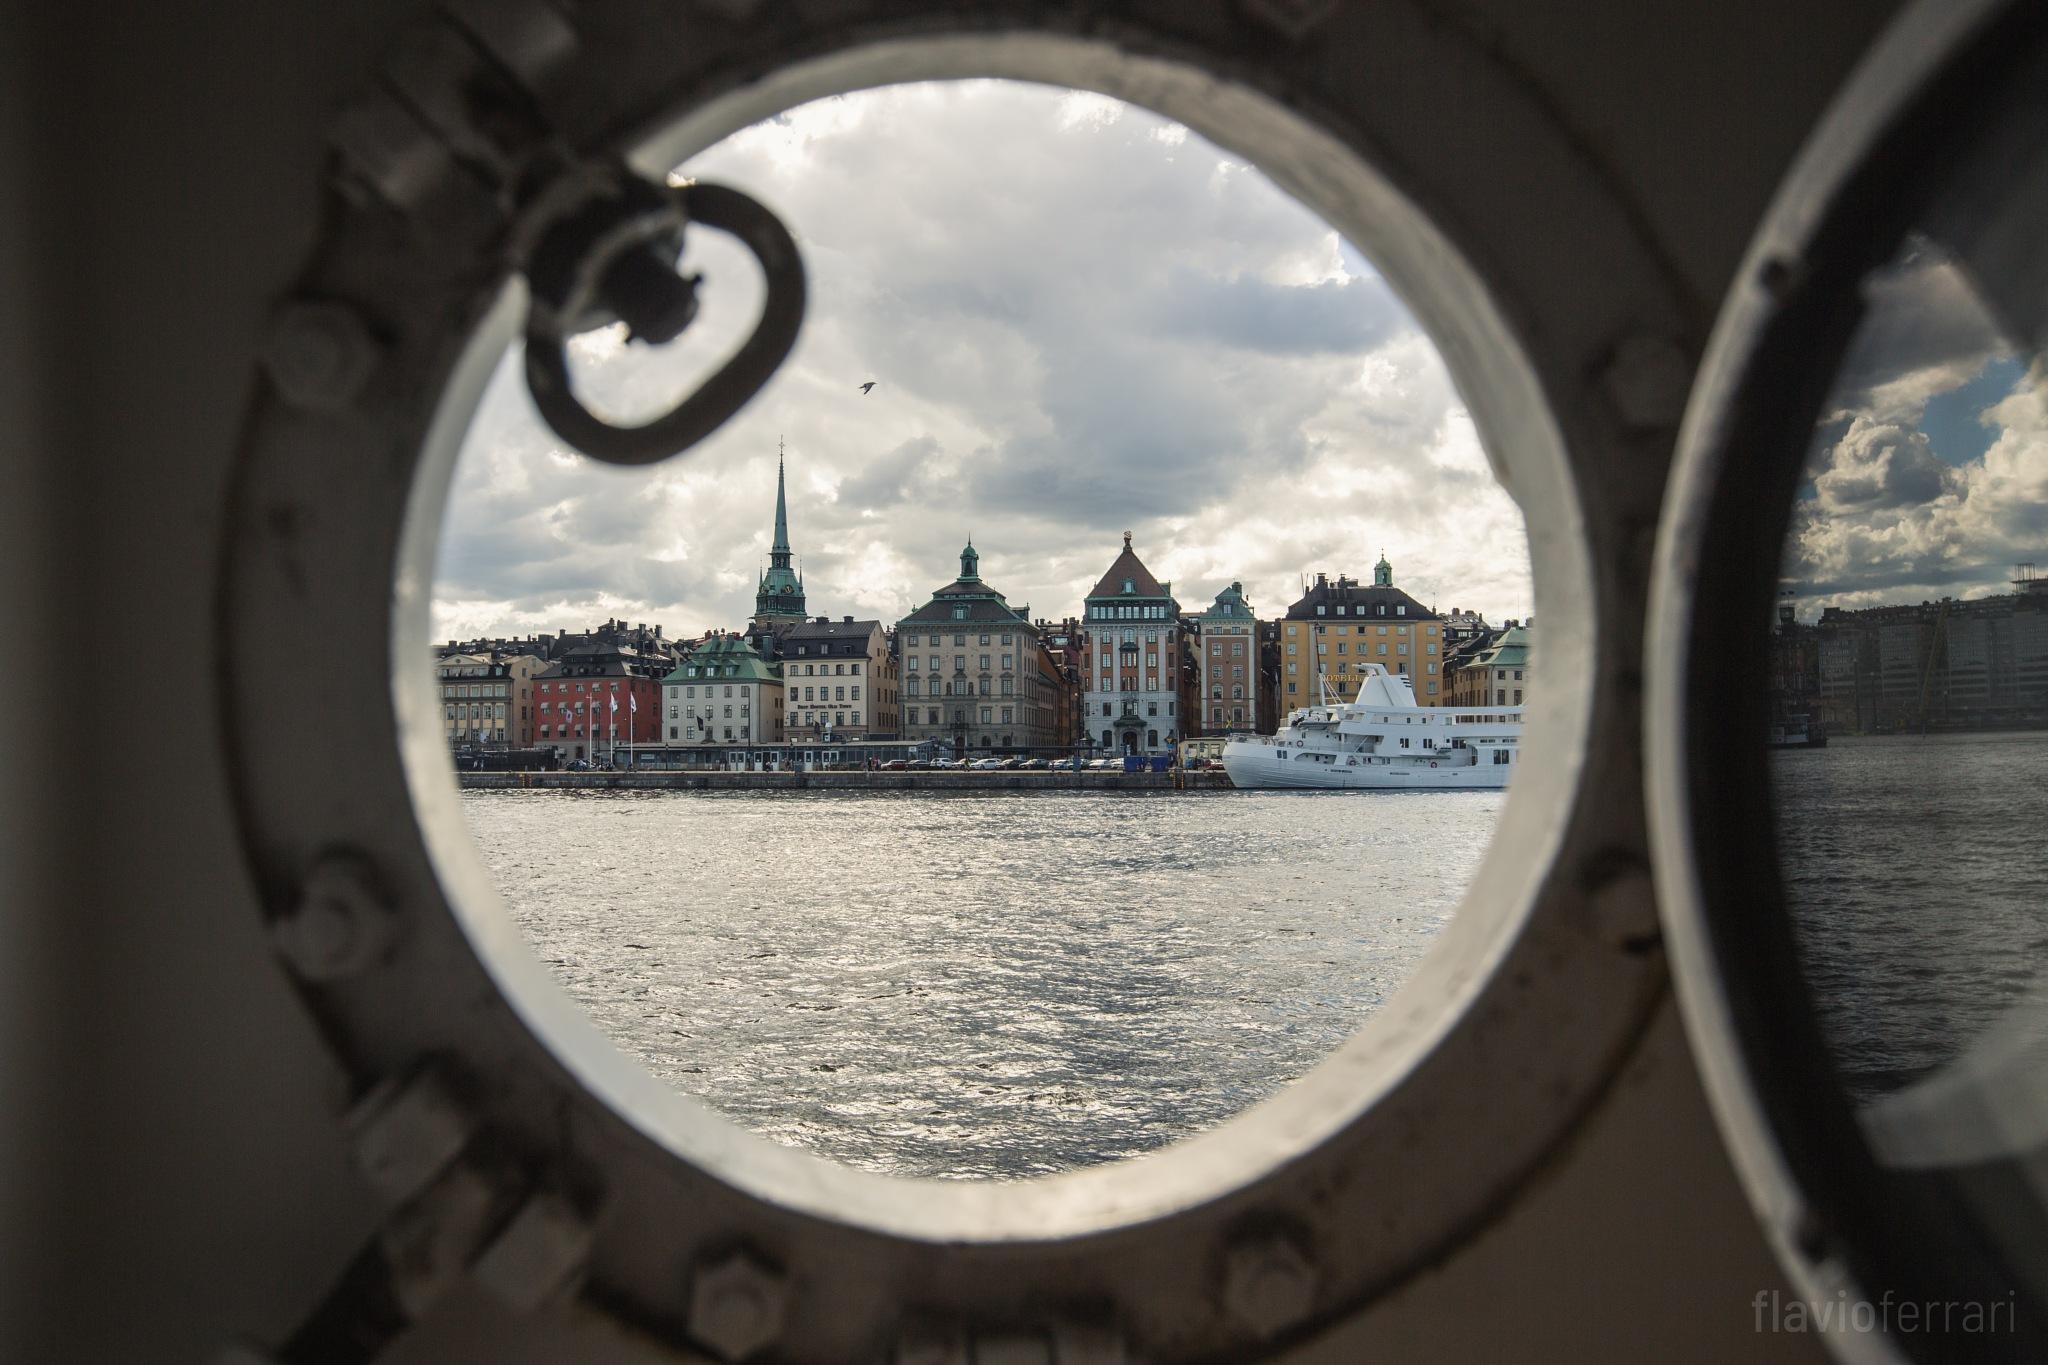 Through the Porthole by Flavio Ferrari